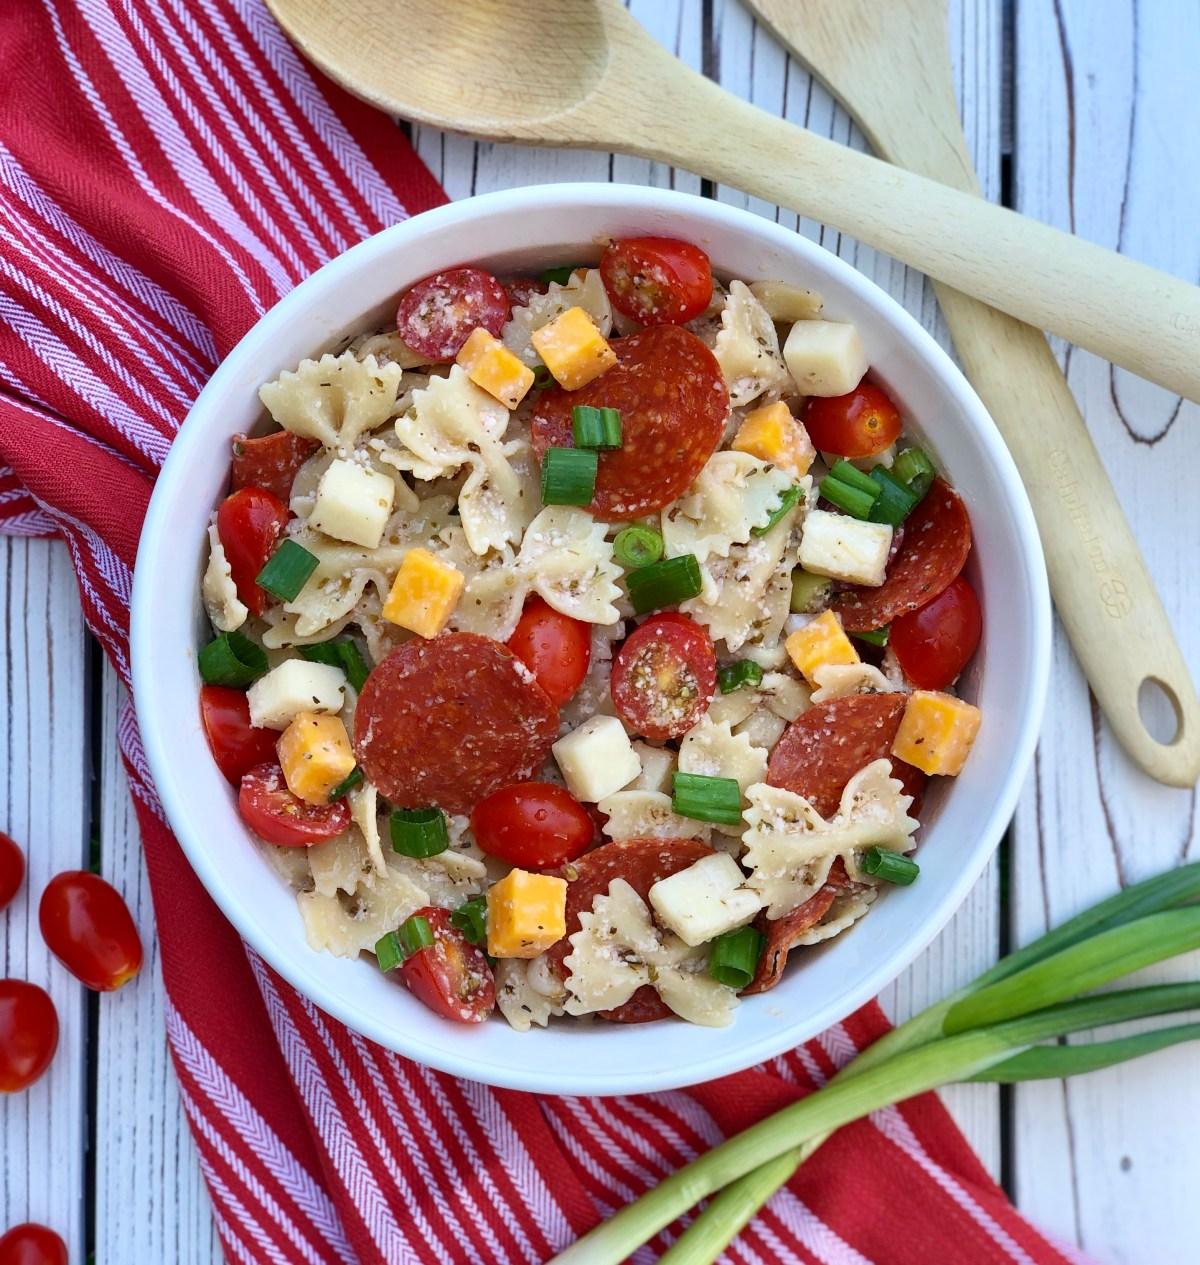 Pizza Pasta Salad by Happylifeblogspot.com #pizzasalad #pastasalad #summersidedish #sidesish #pepperoni #bowtiepasta